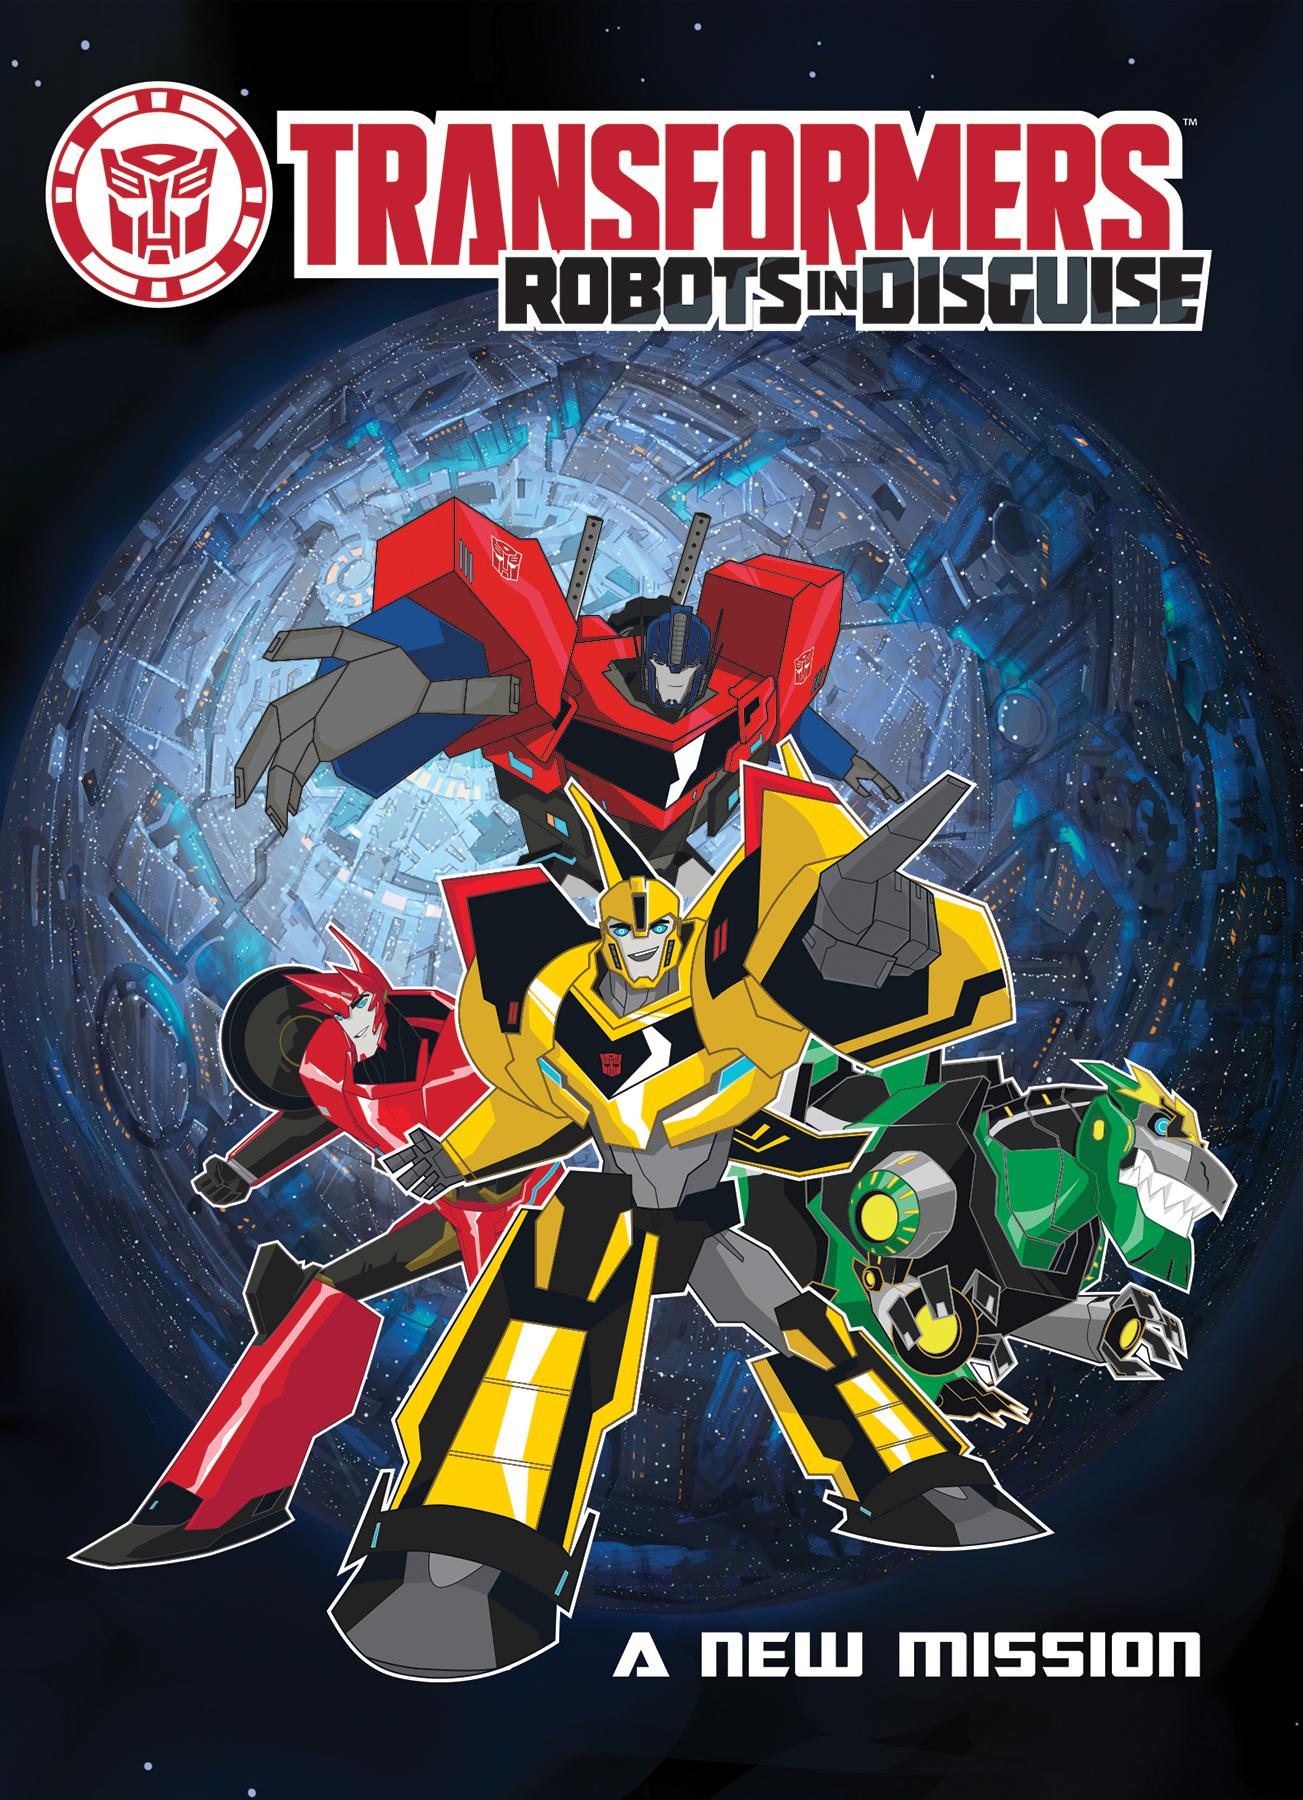 Transformers: Robots in Disguise (2015) Season 4